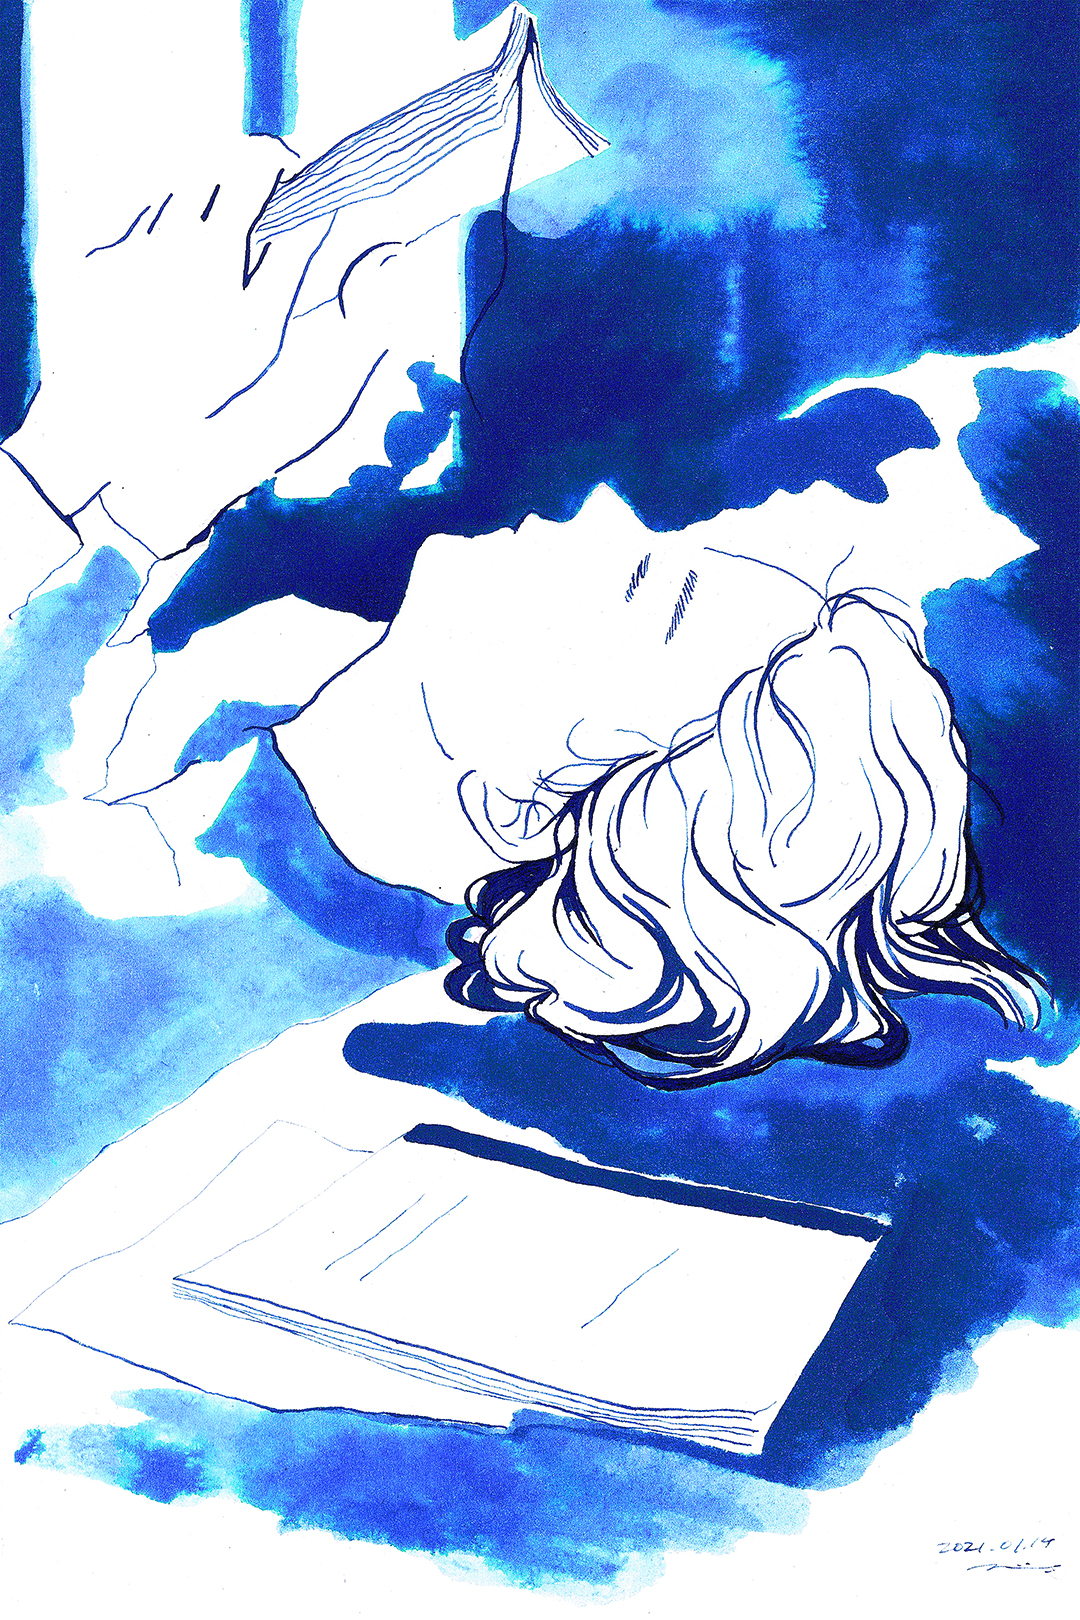 GirlsclubAsia-Illustrator-Sayuri Fujimaki-09